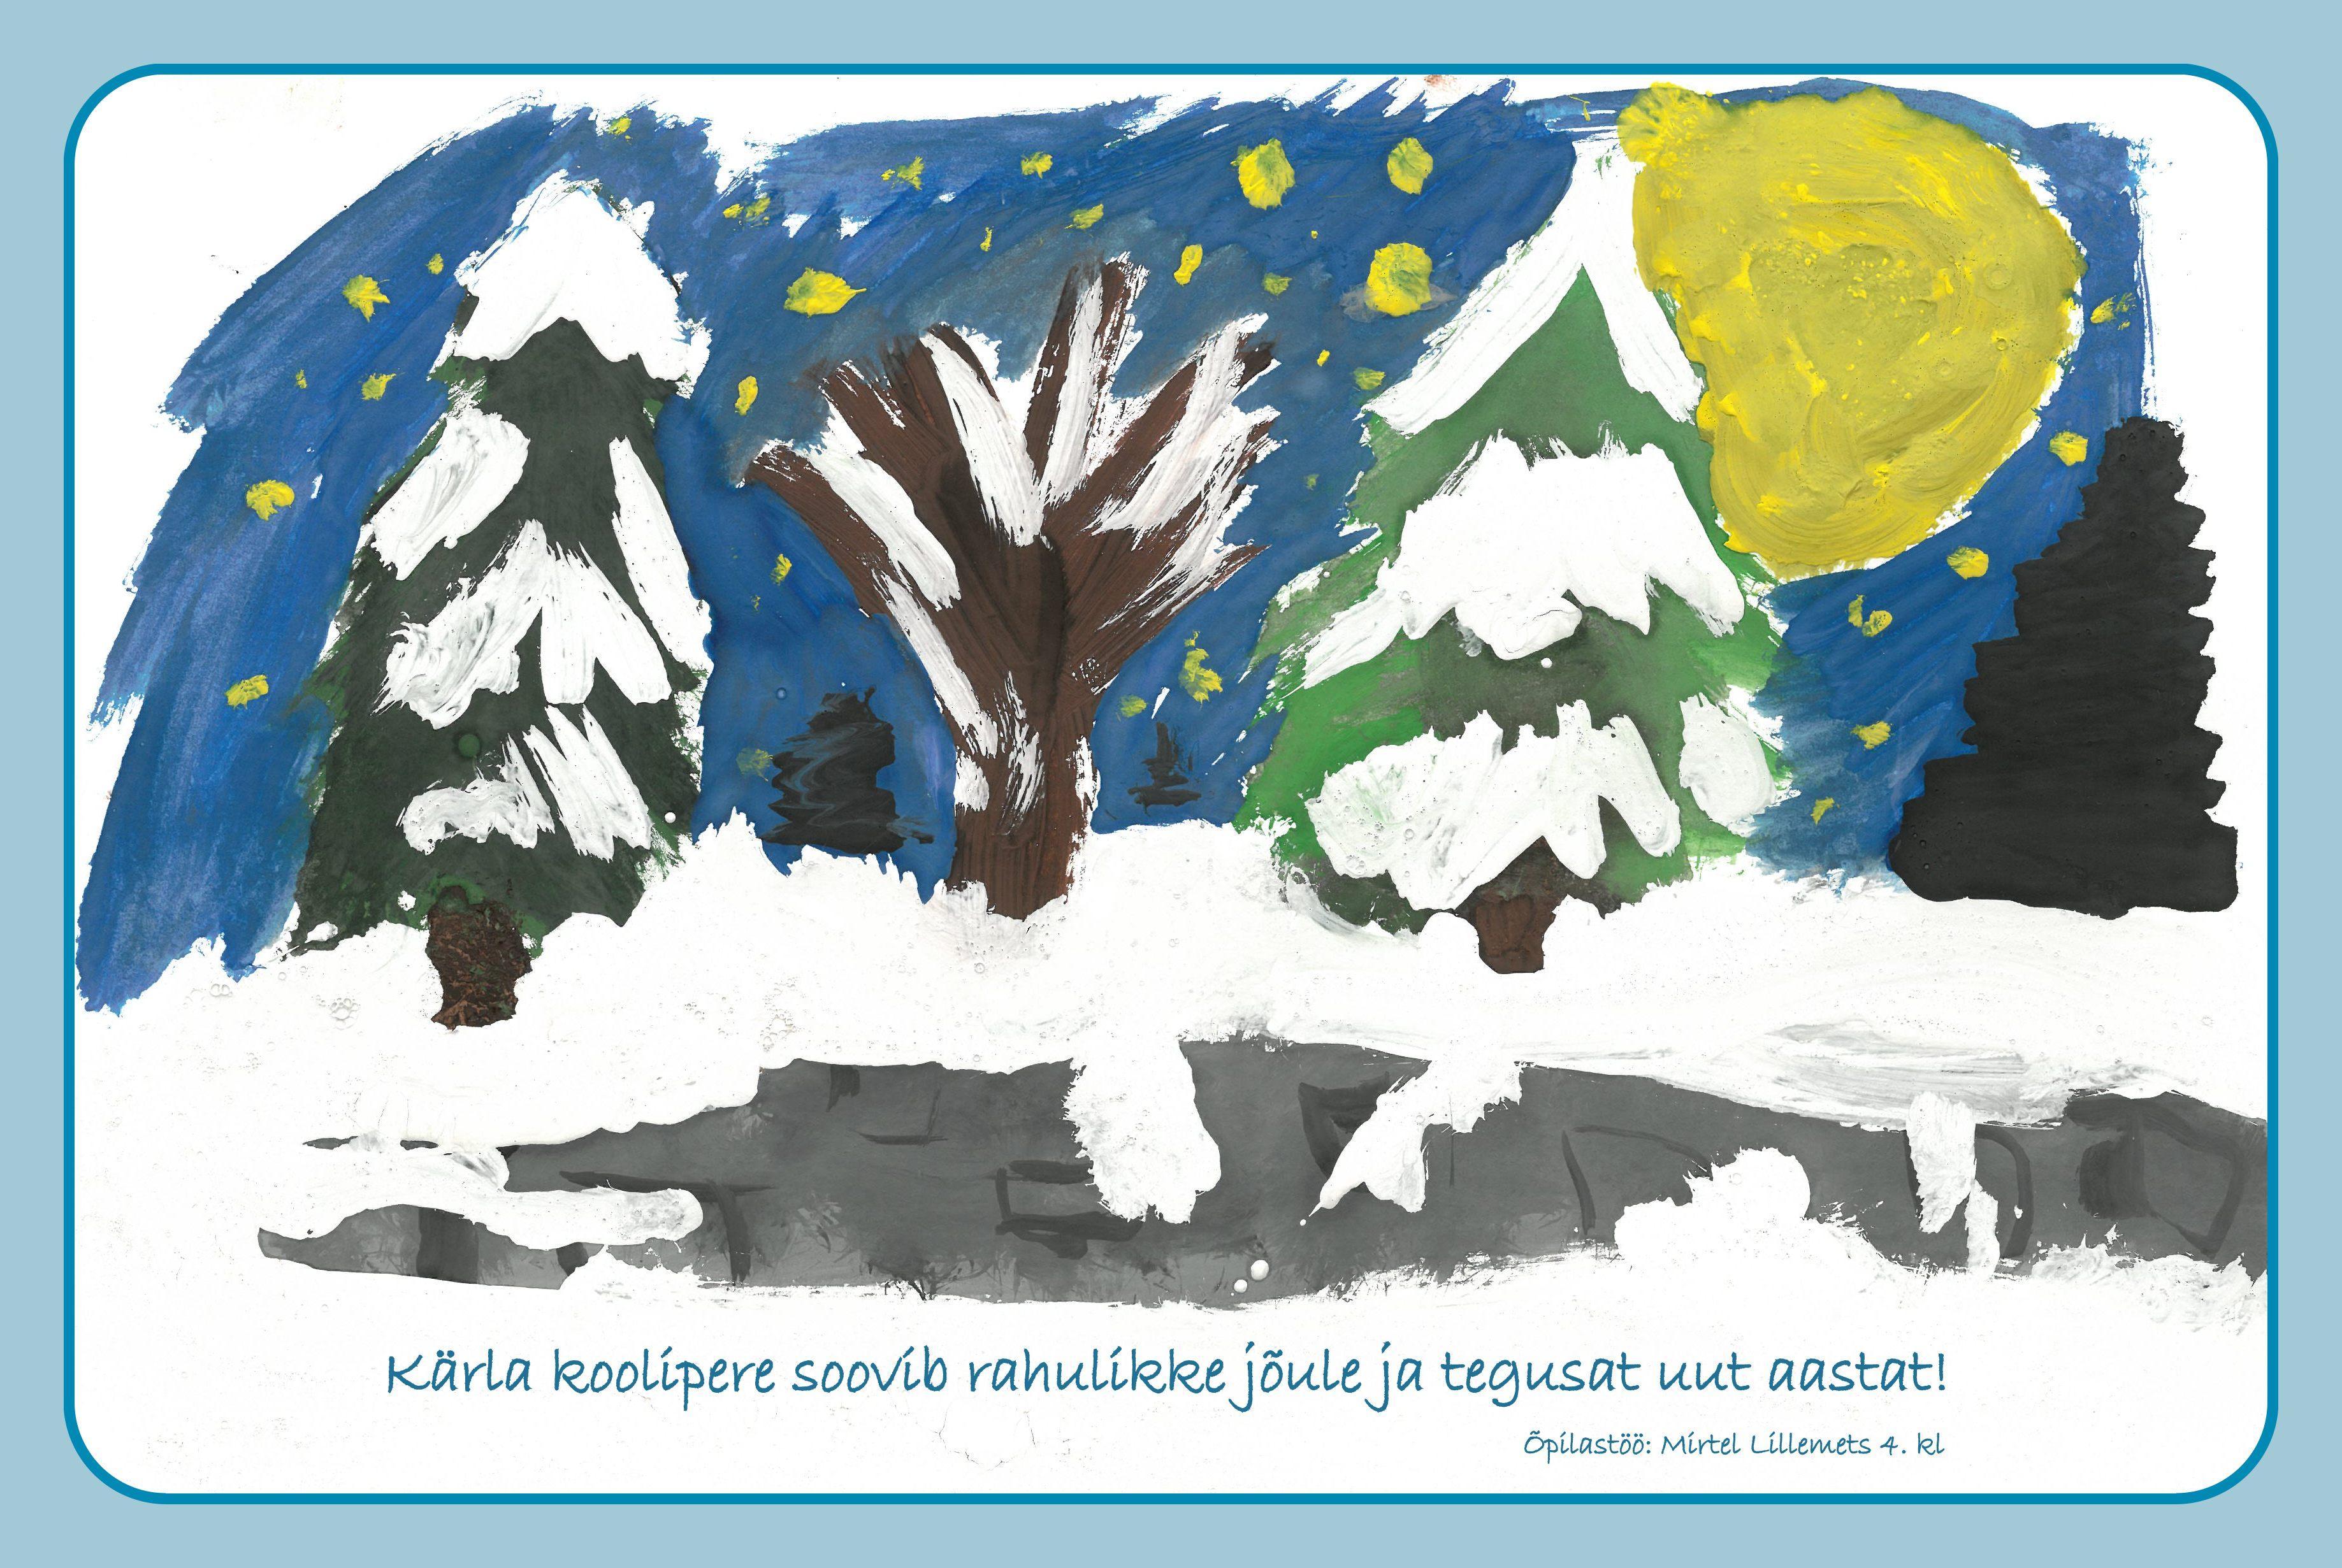 Jõulukaart. Õpilastöö Mirtel Lillemets 4. klass